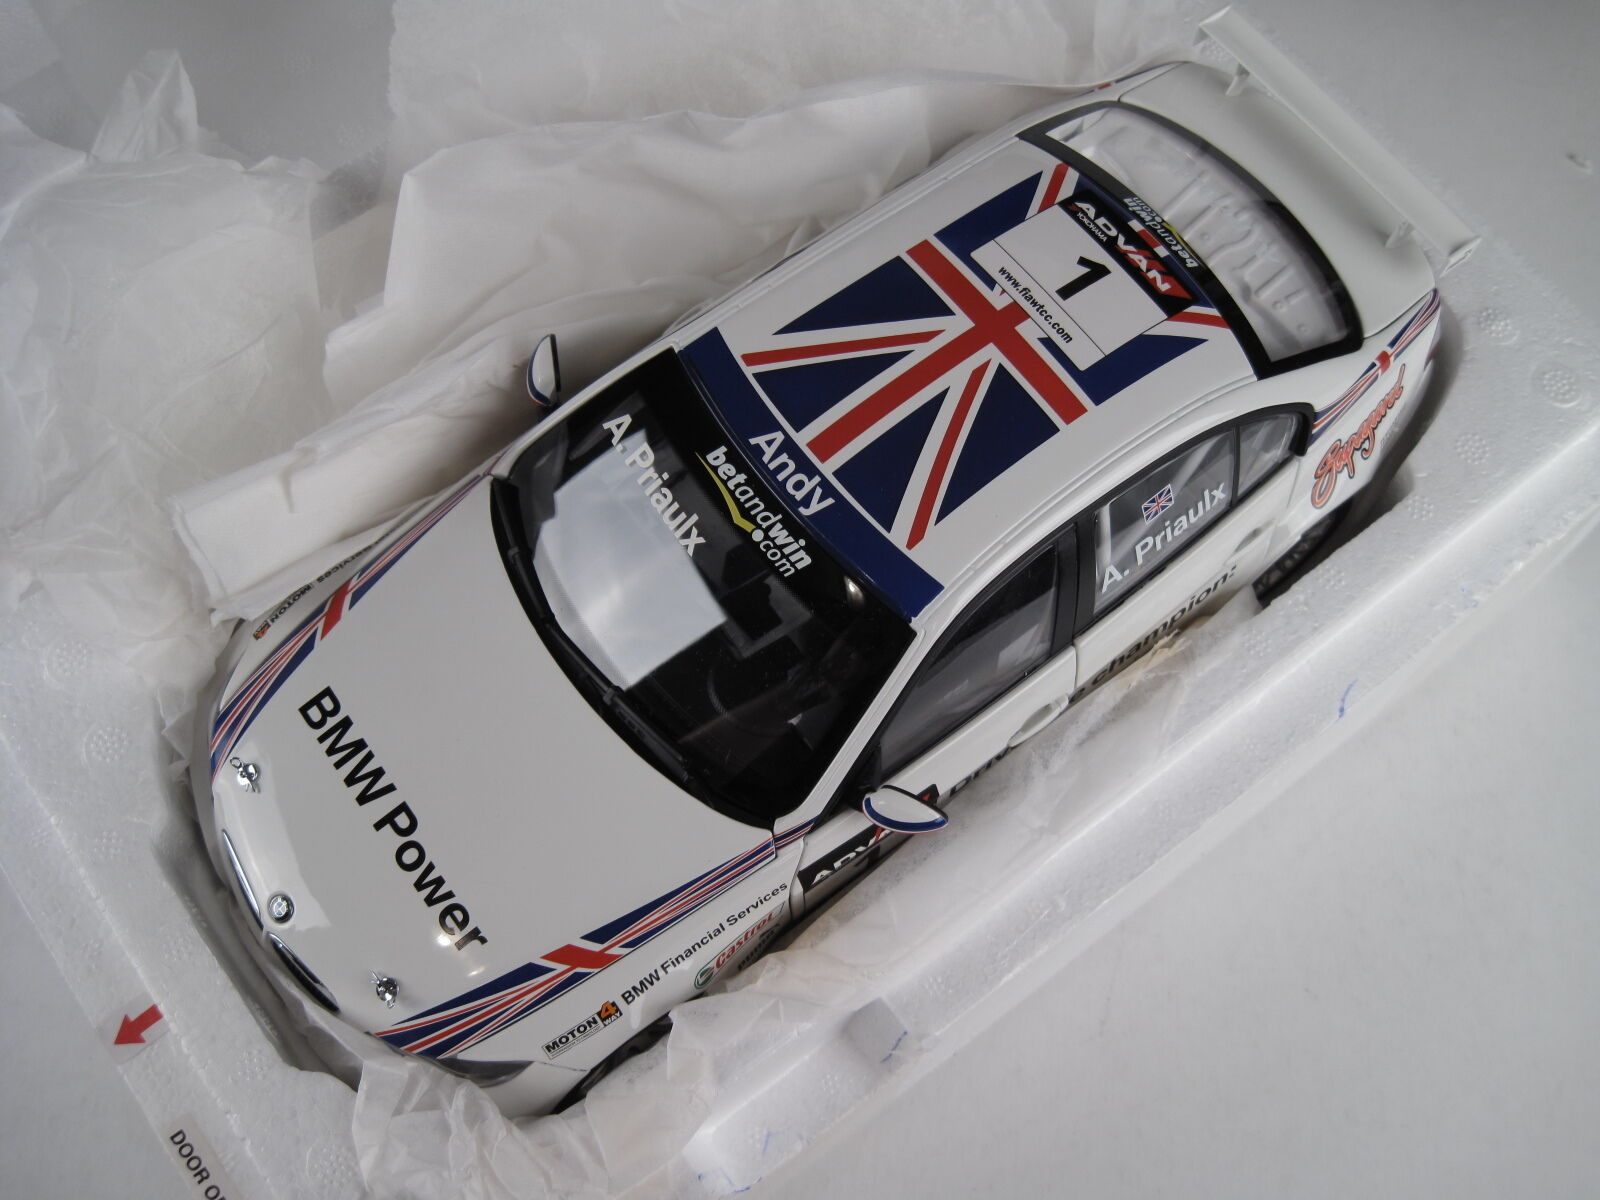 KYOSHO-BMW 320si World Tour Car Championship  WTCC  2006 1:18 - NUOVO